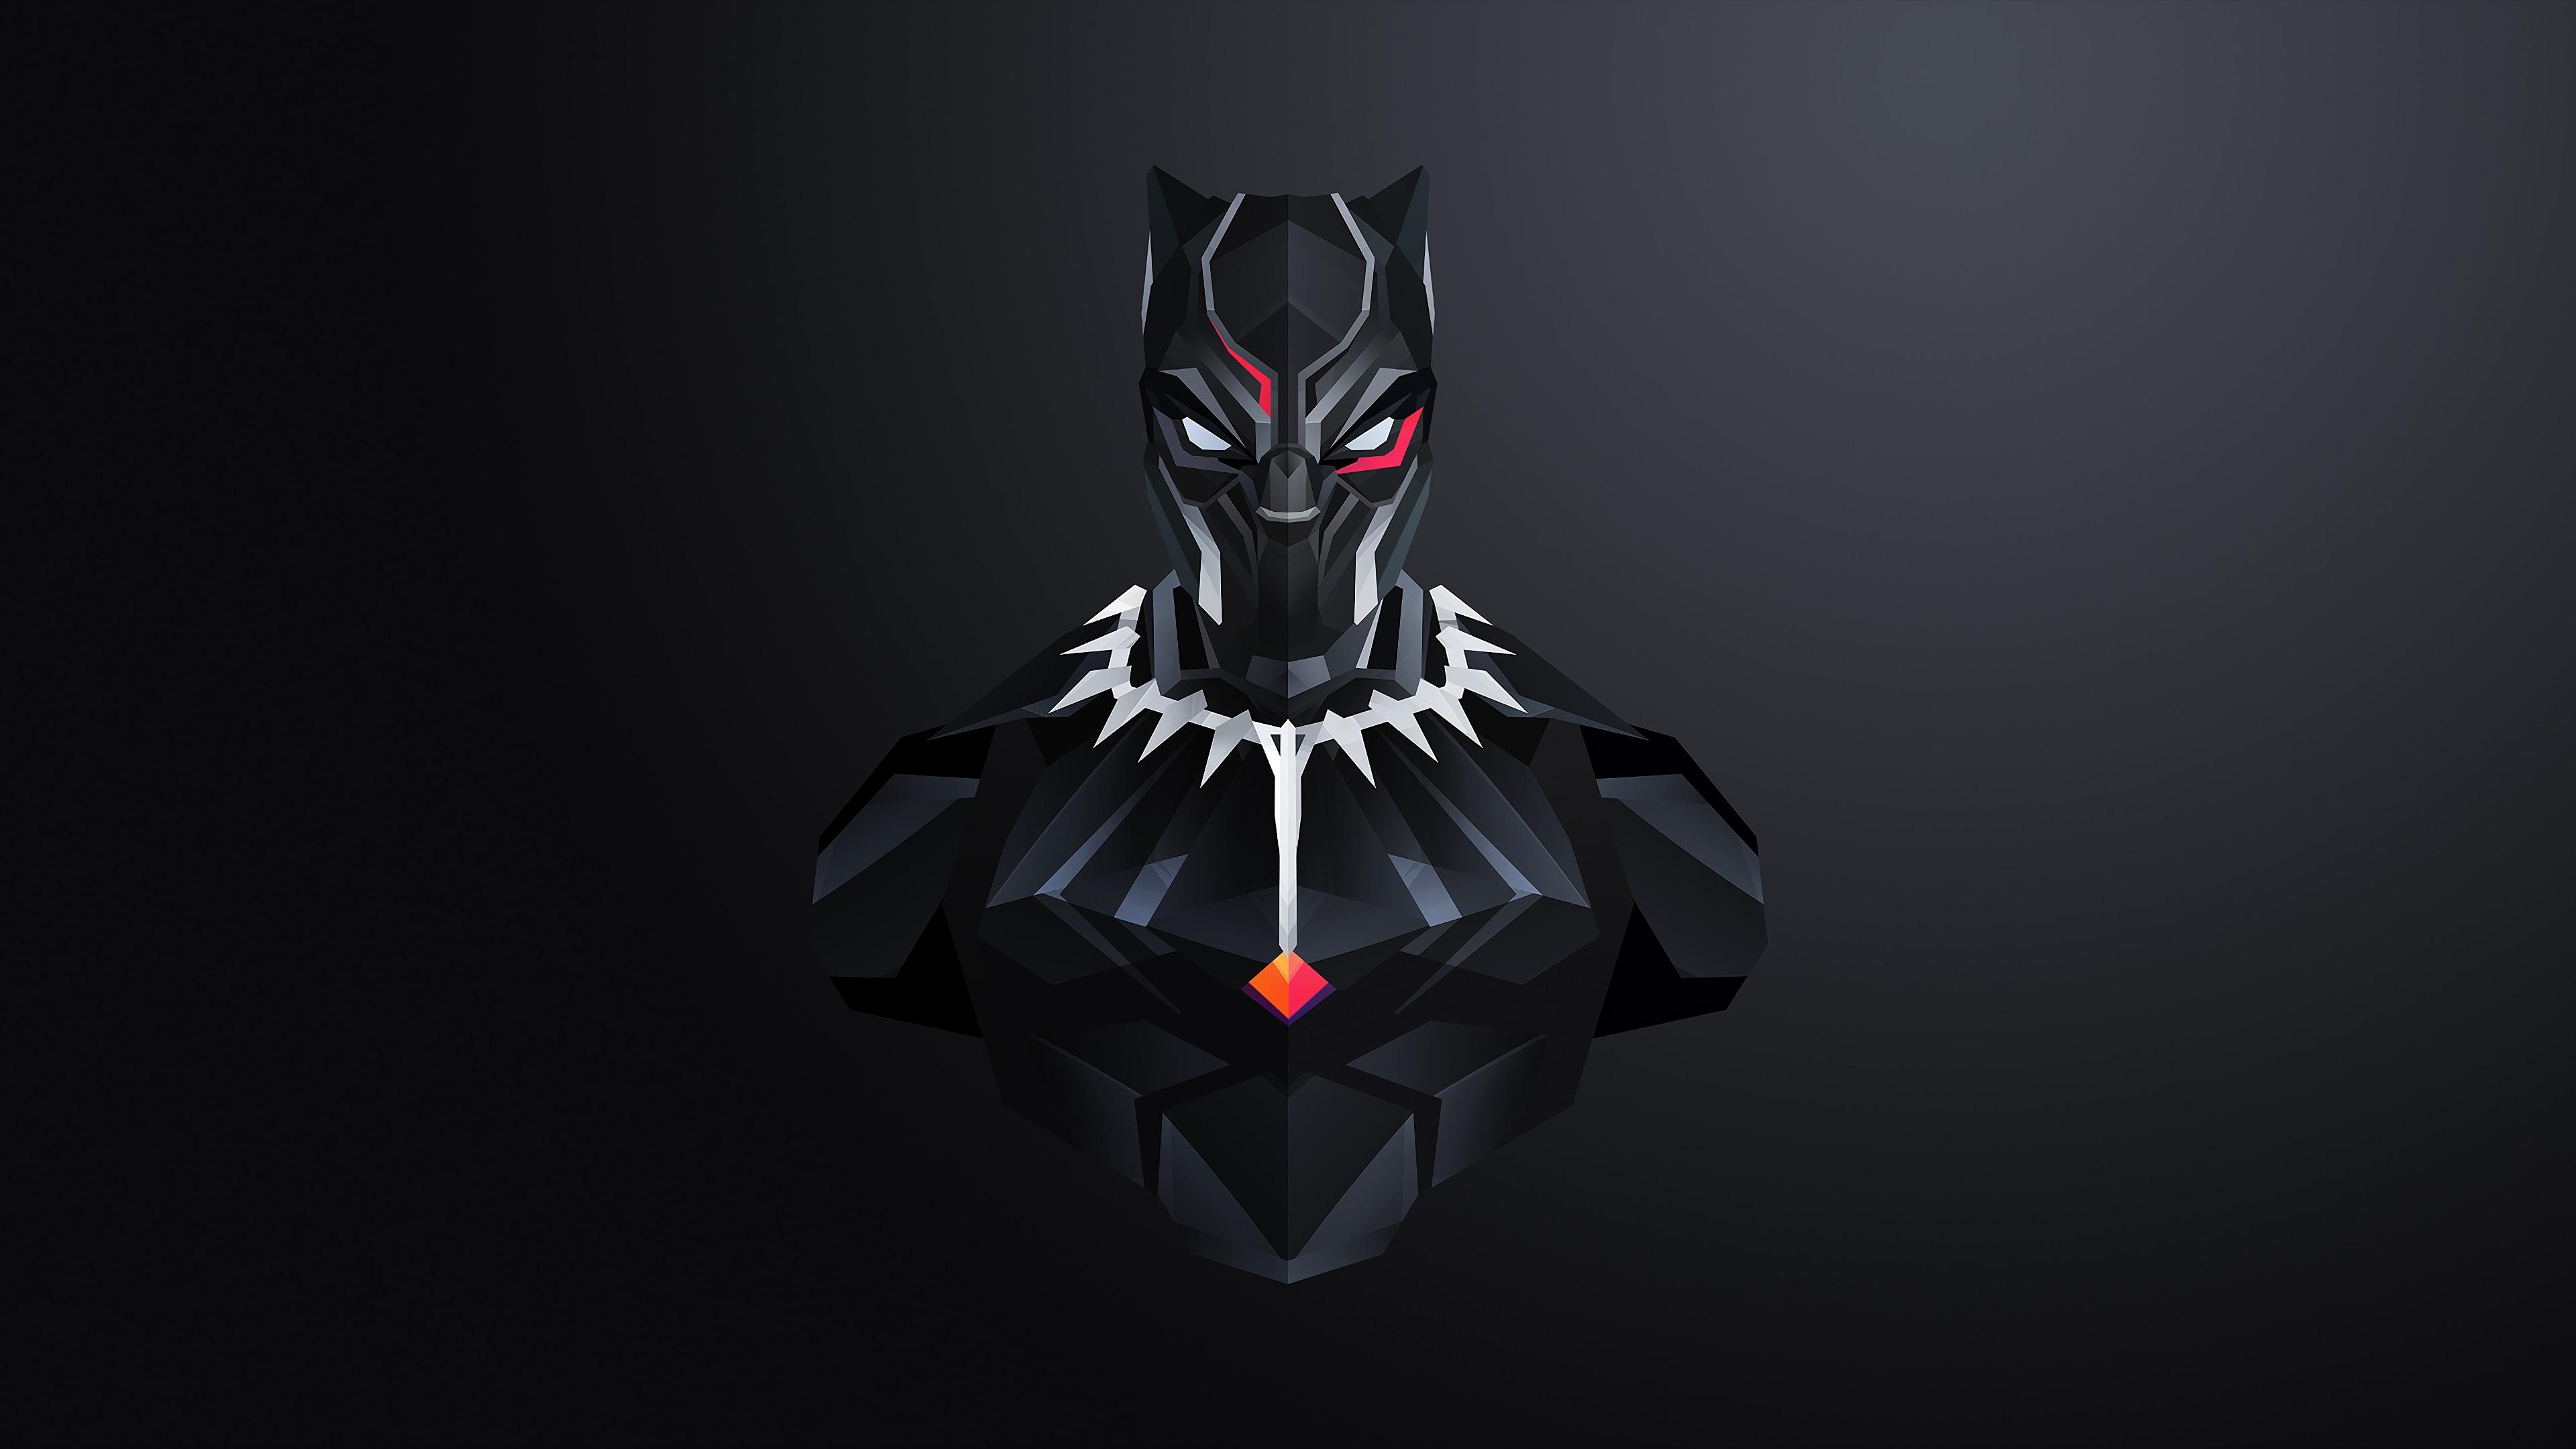 black Panther 4k [3840x2160] wallpaper 3840x2160